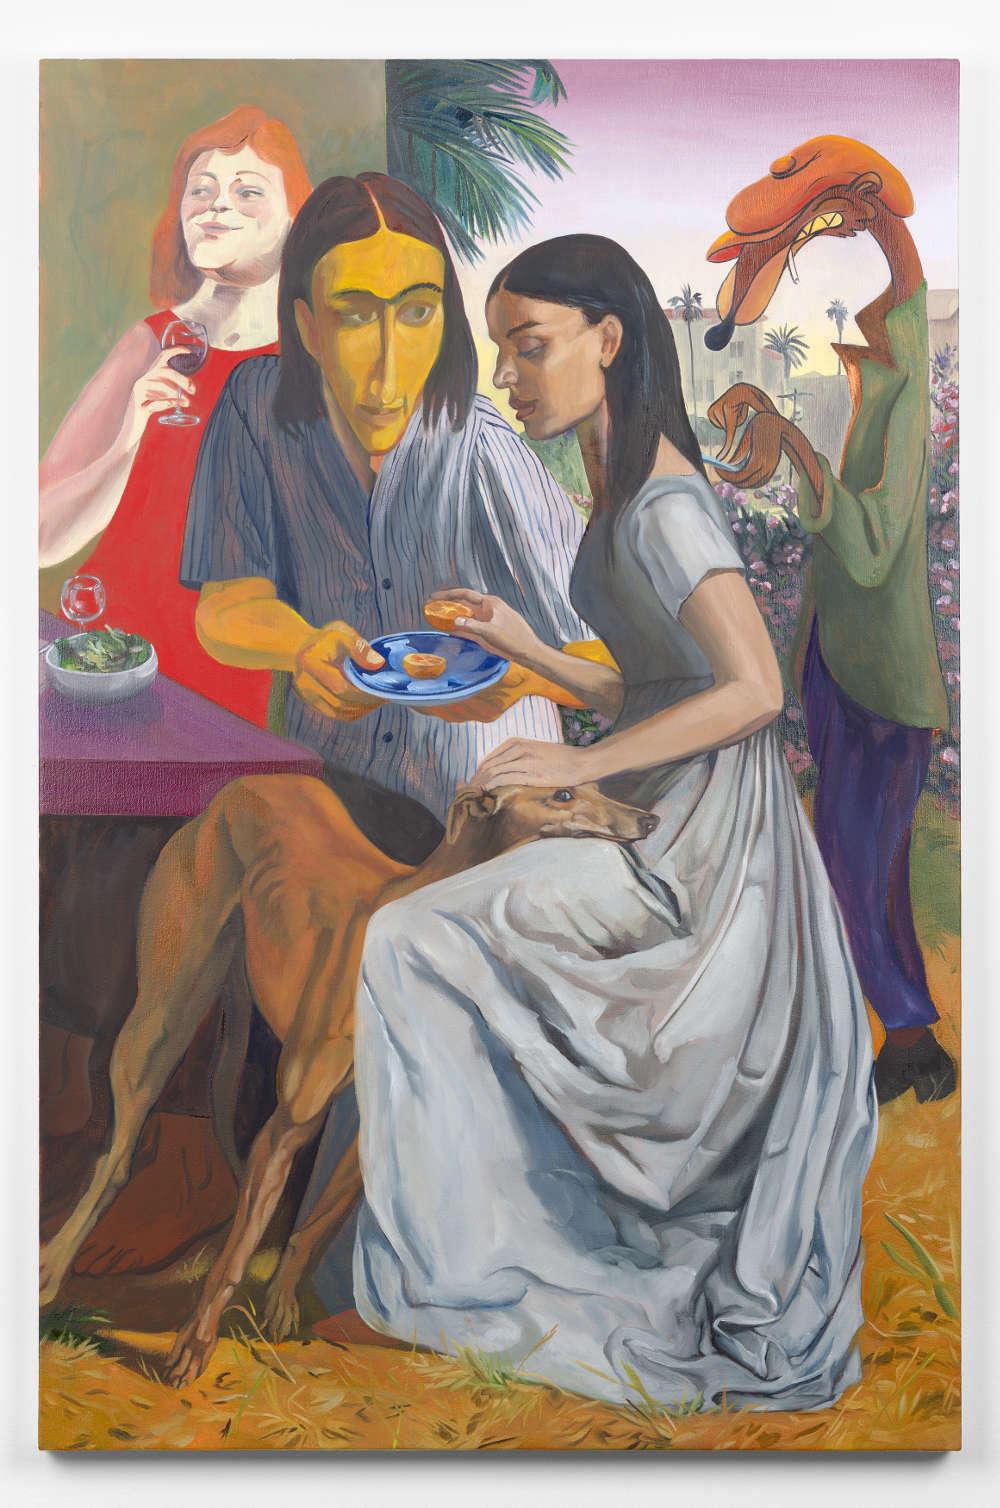 Justin John Greene, Isabella, 2018. Oil on canvas 104.1 x 68.6 cm (41 x 27 in.)